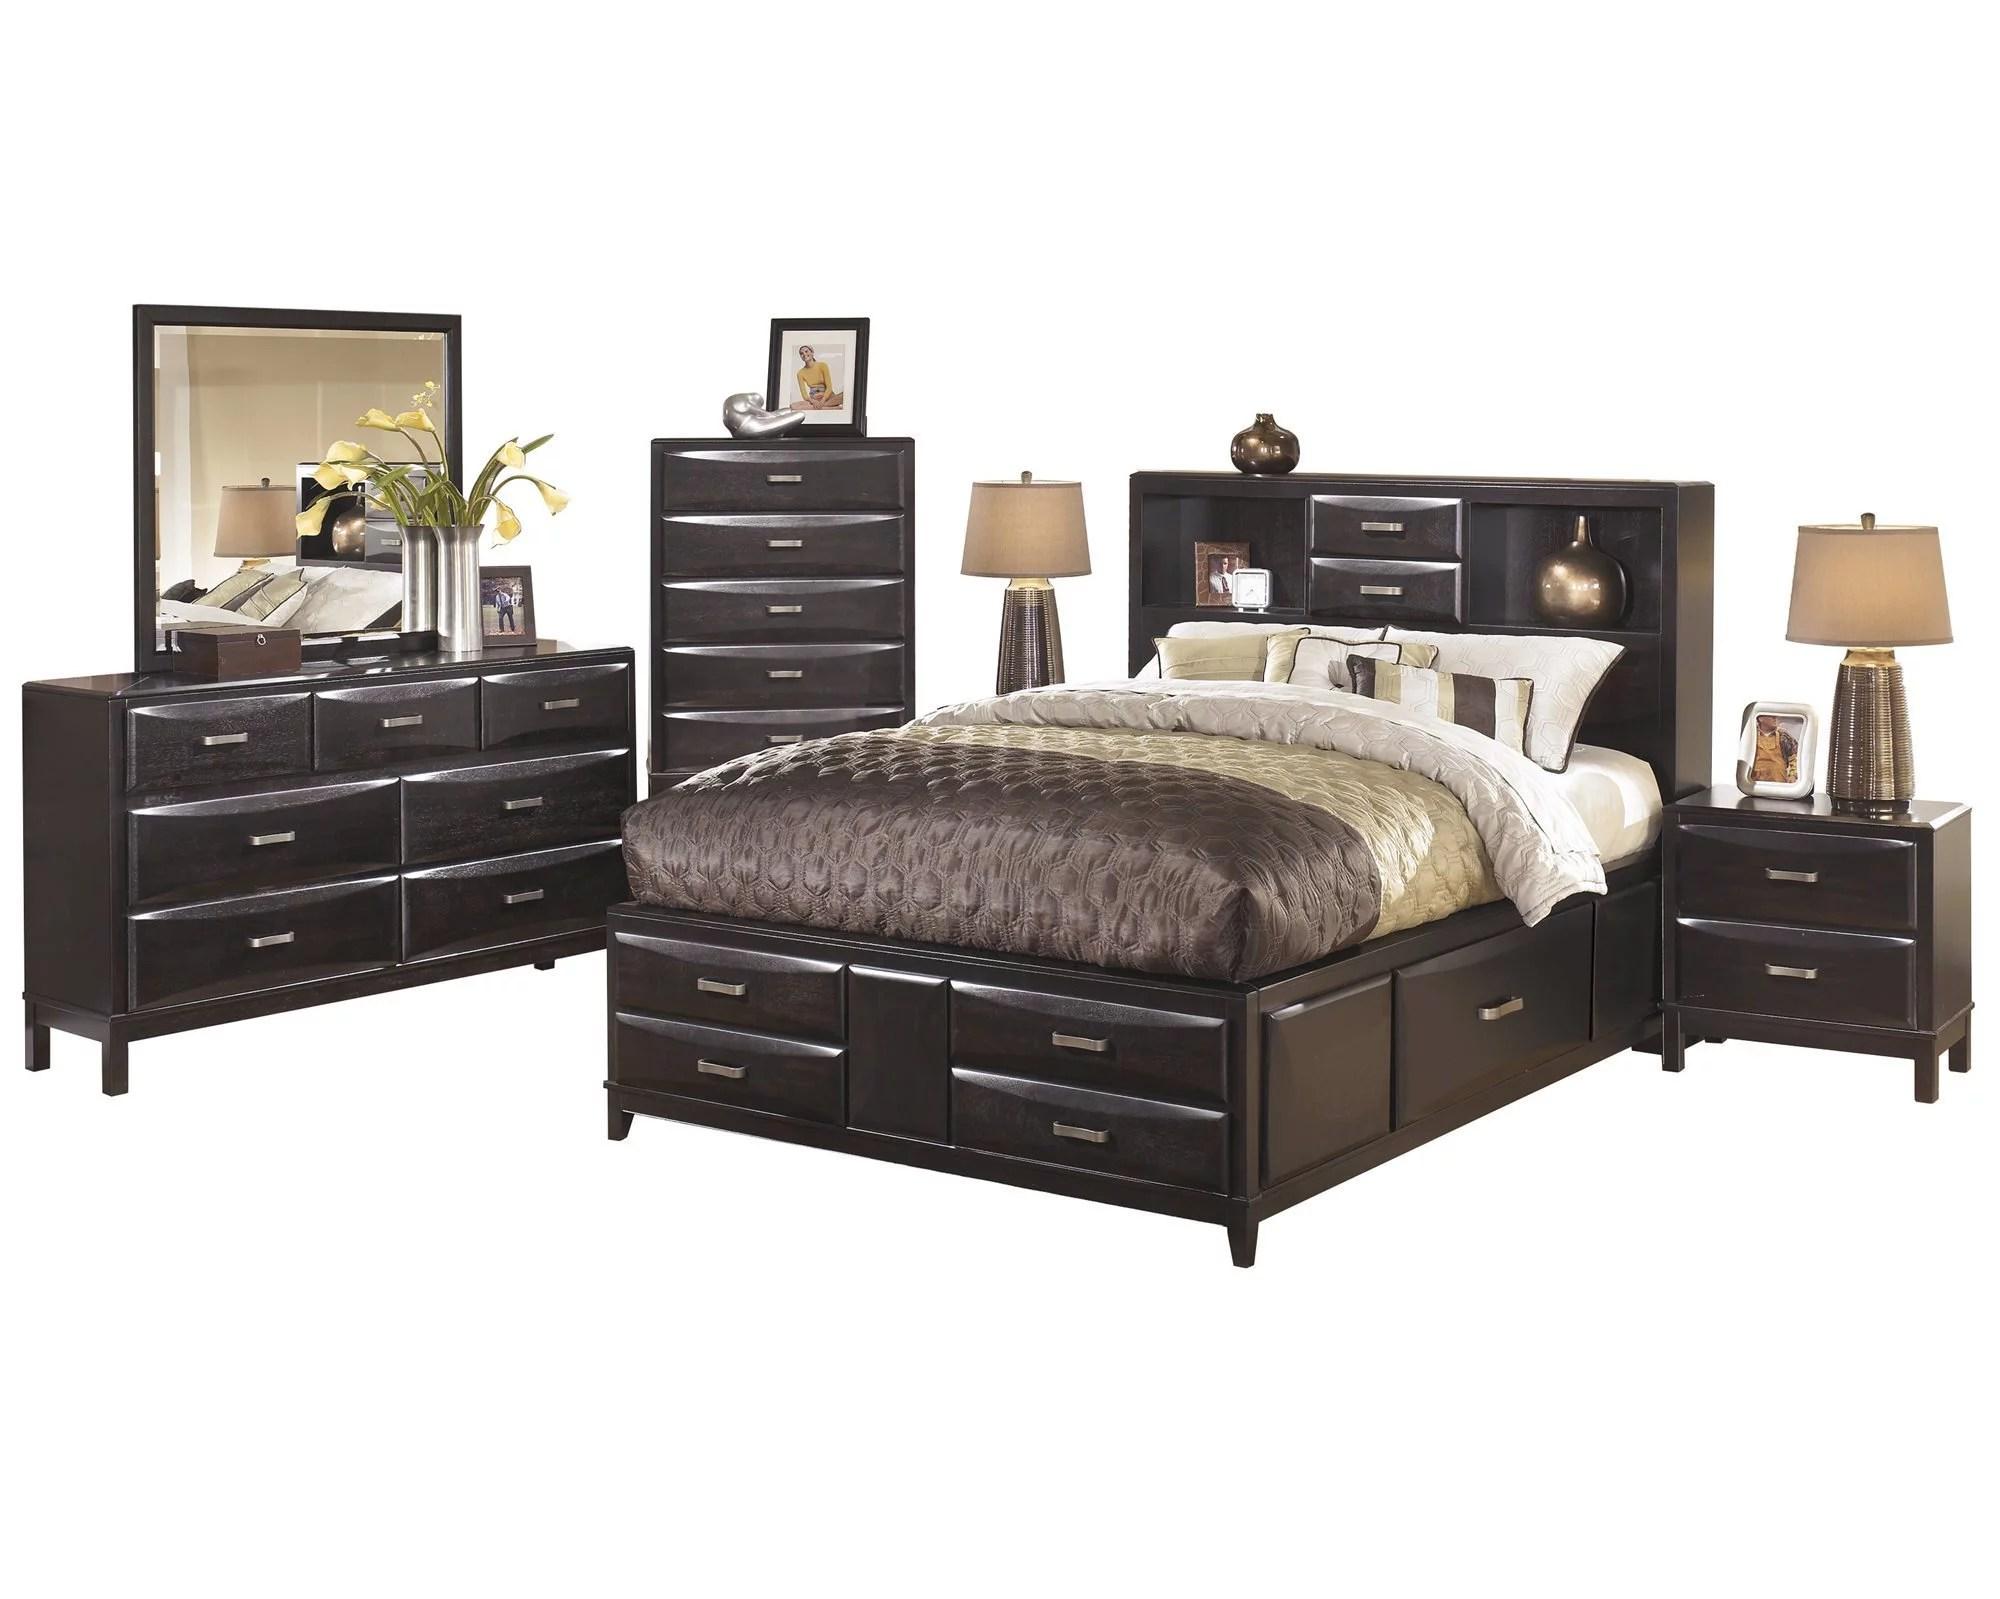 Ashley Furniture Kira 6 Pc Bedroom Set Queen Storage Bed Dresser Mirror 2 Nightstand Chest Black Walmart Com Walmart Com